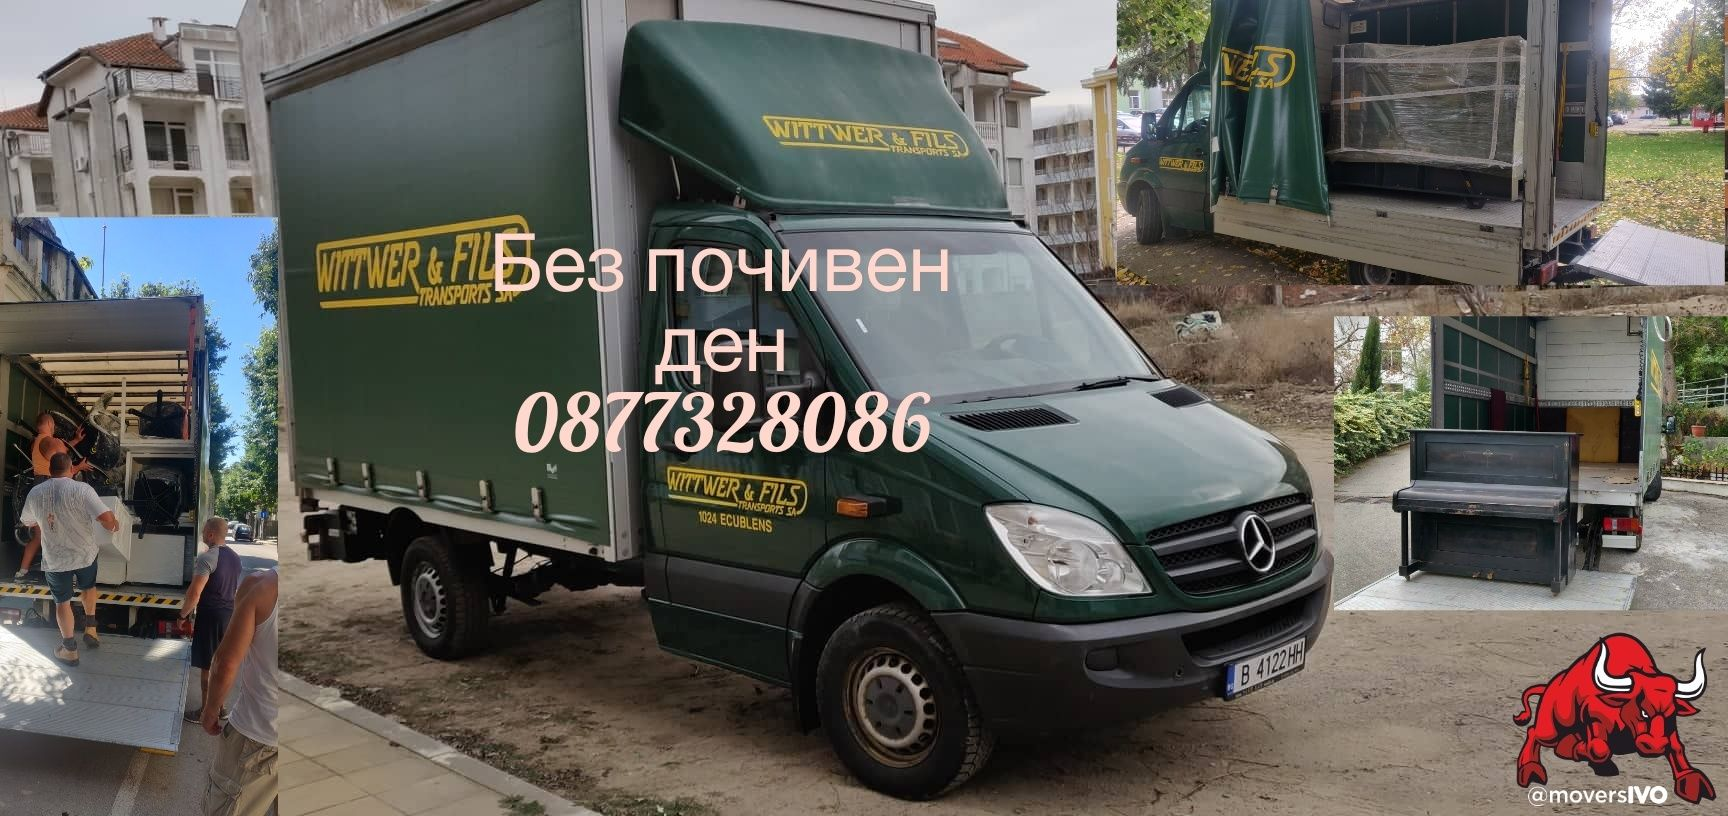 Транспортни услуги и Хамали - Варна и страната. Без почивен ден!